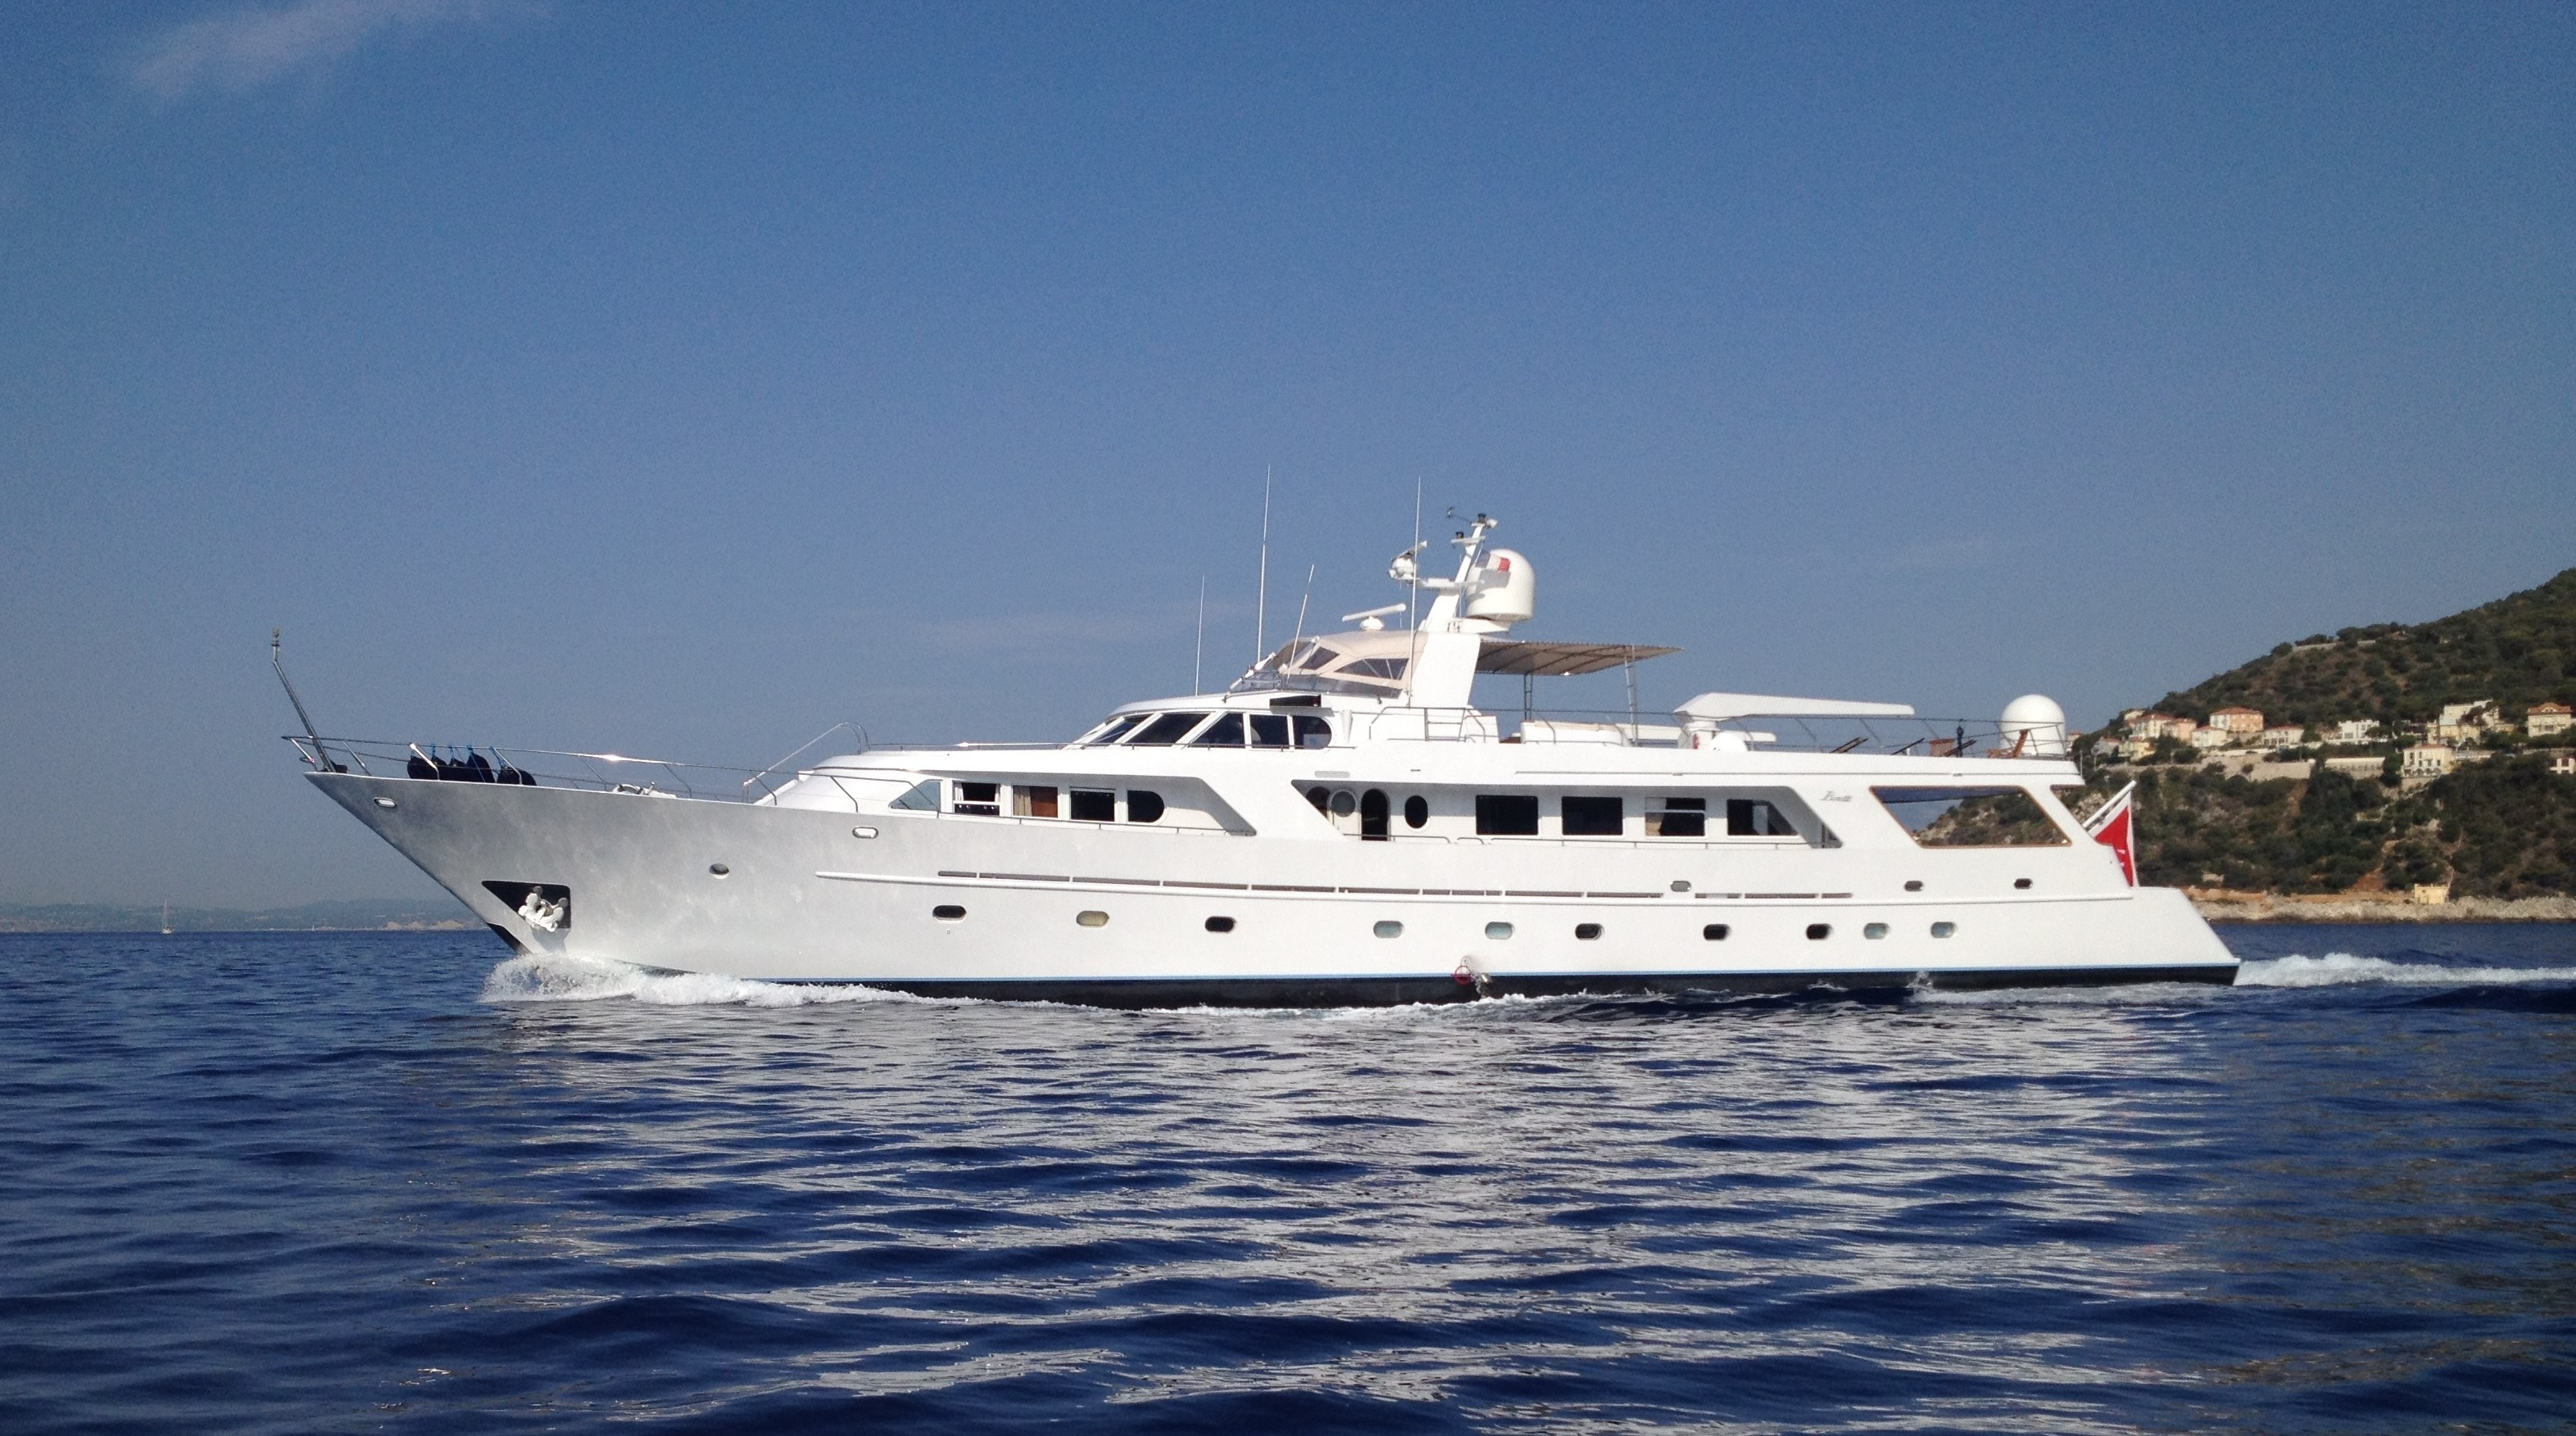 Motor yacht INDIA cruising the Mediterranean